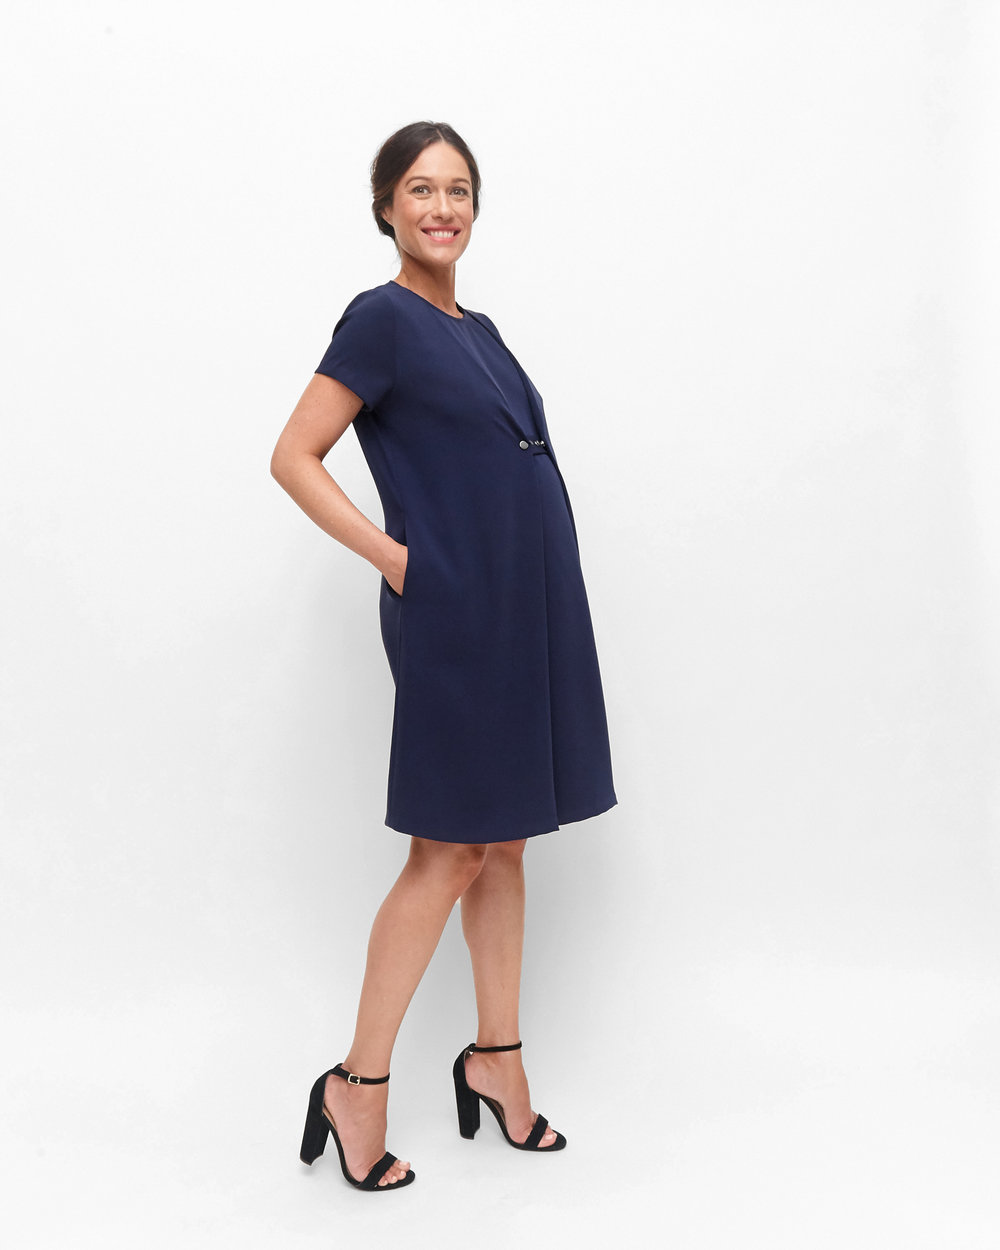 Of - Mercer - Maternity - BROOKFIELD DRESS - 2.jpg